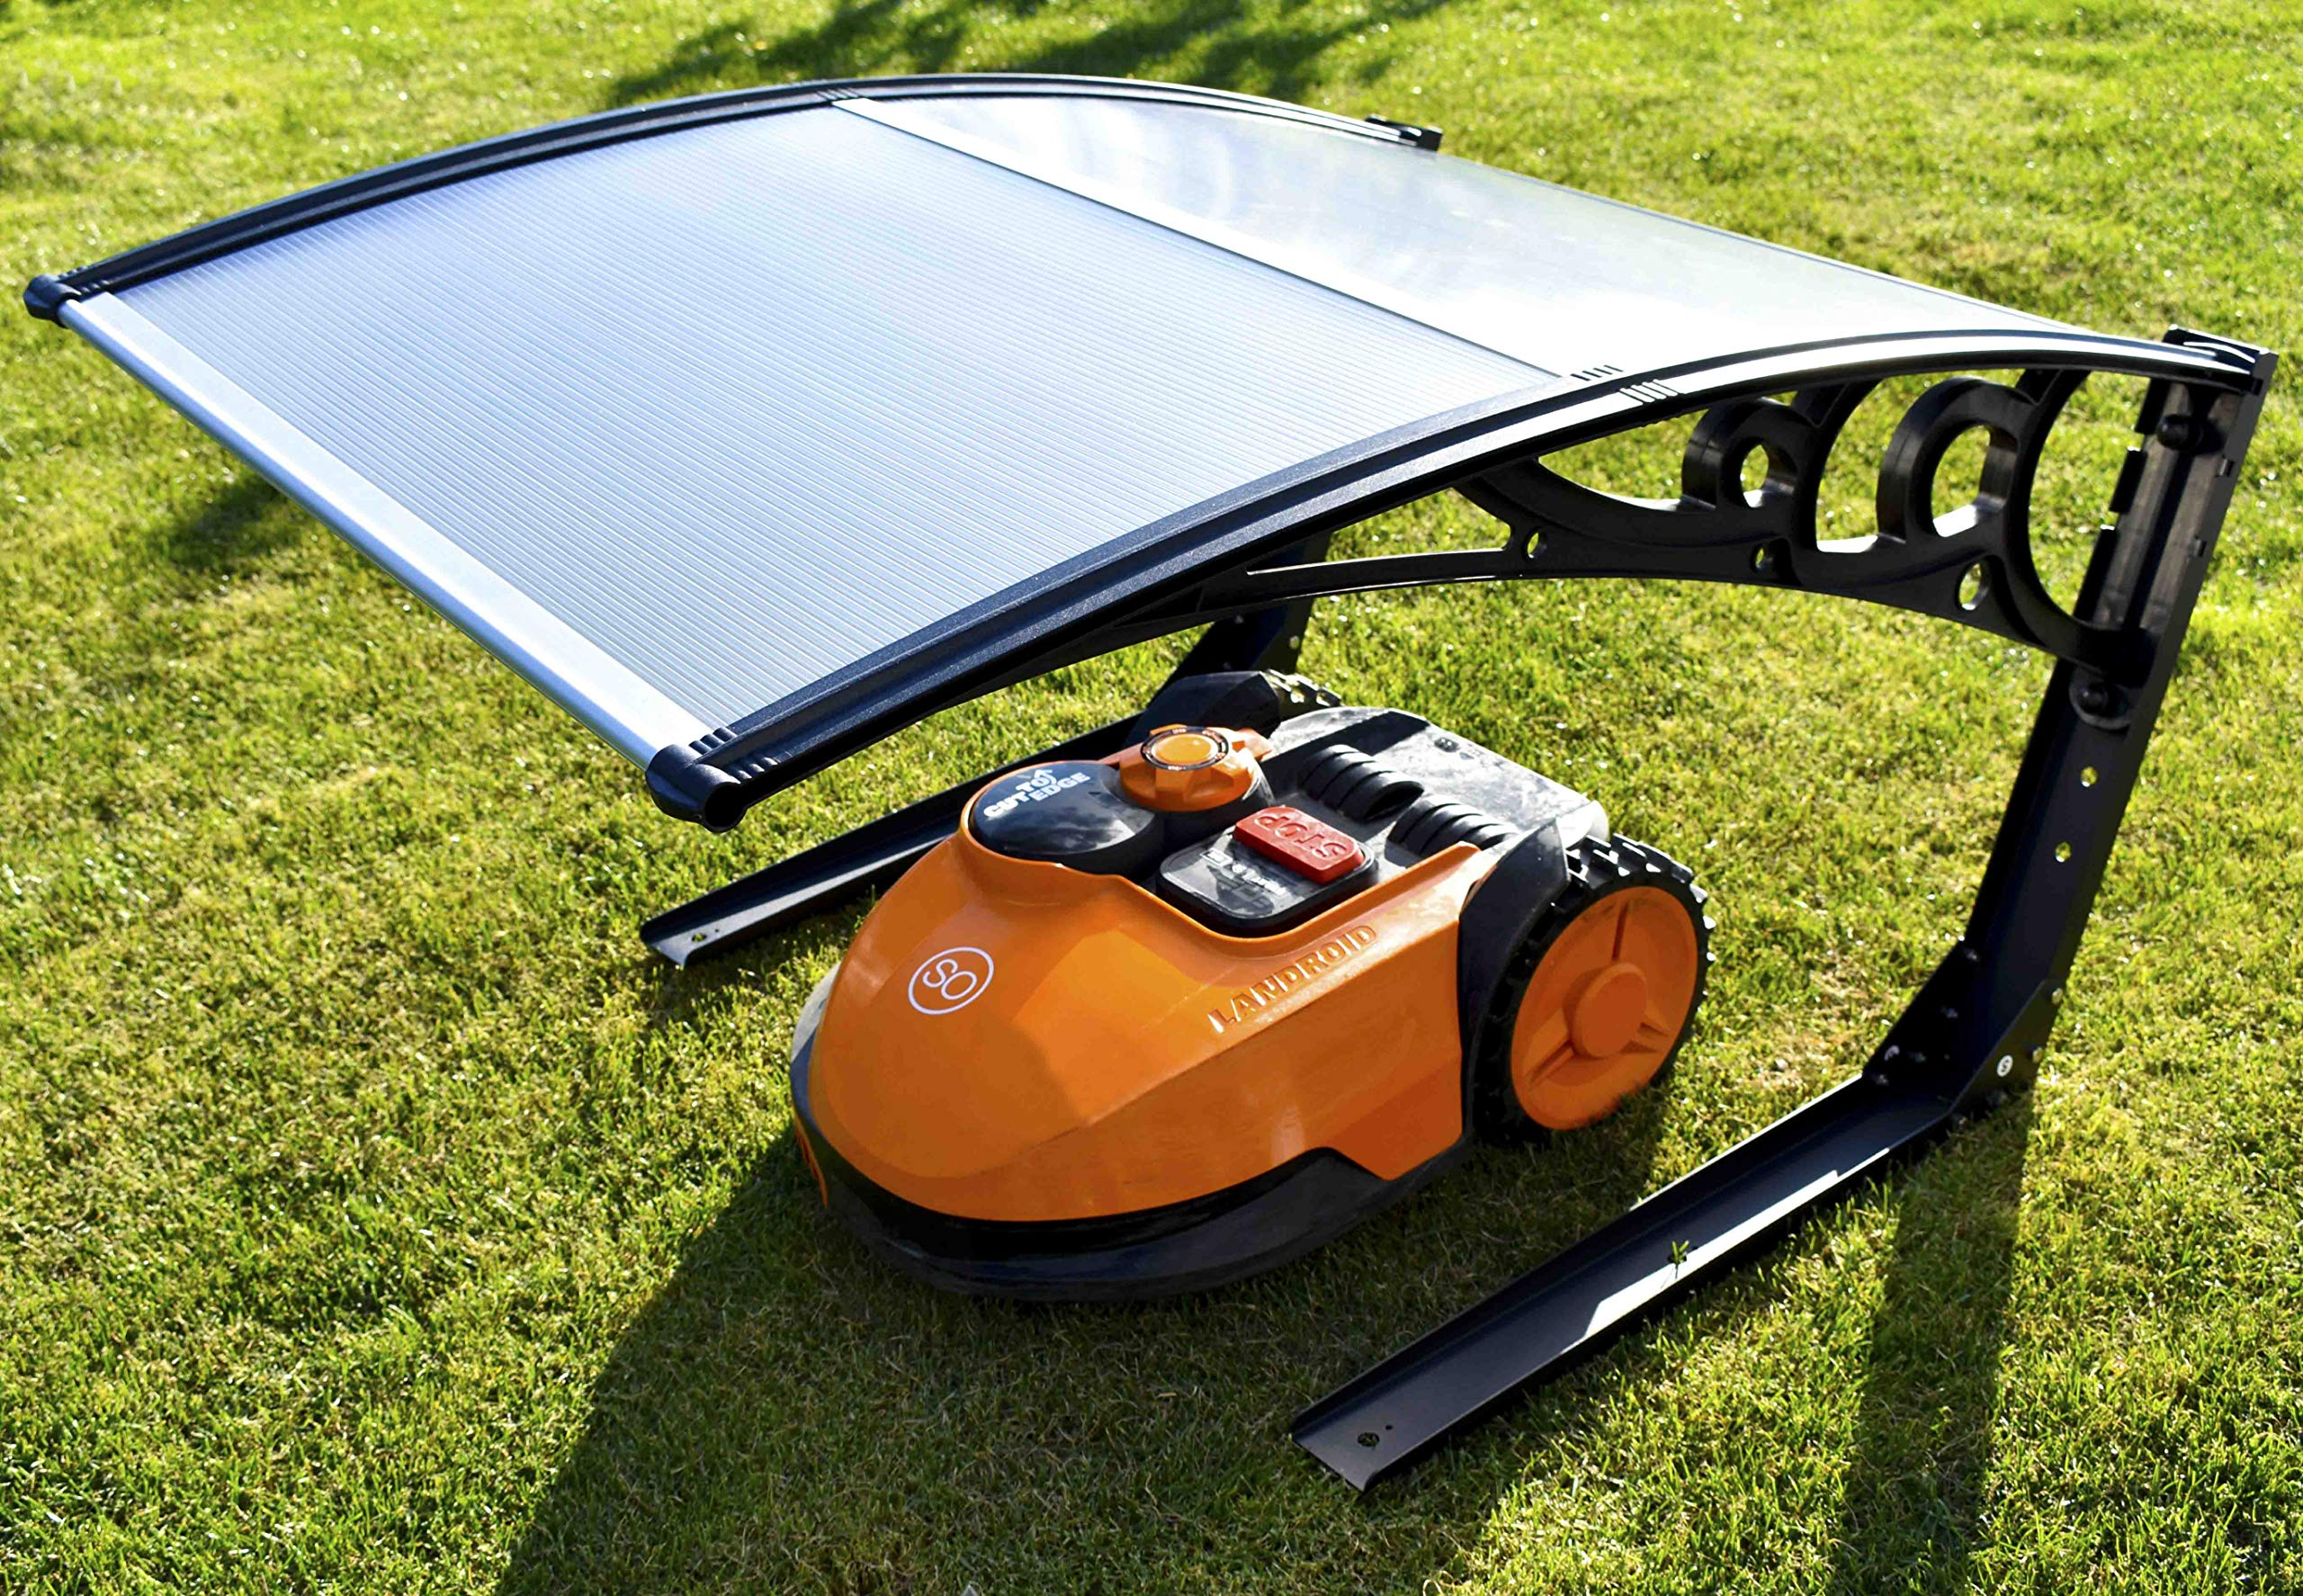 SHS-Mhrobotor-Garage-Rasenmher-Roboter-Carport-fr-Rasenmher-Automower-Mower-Robot